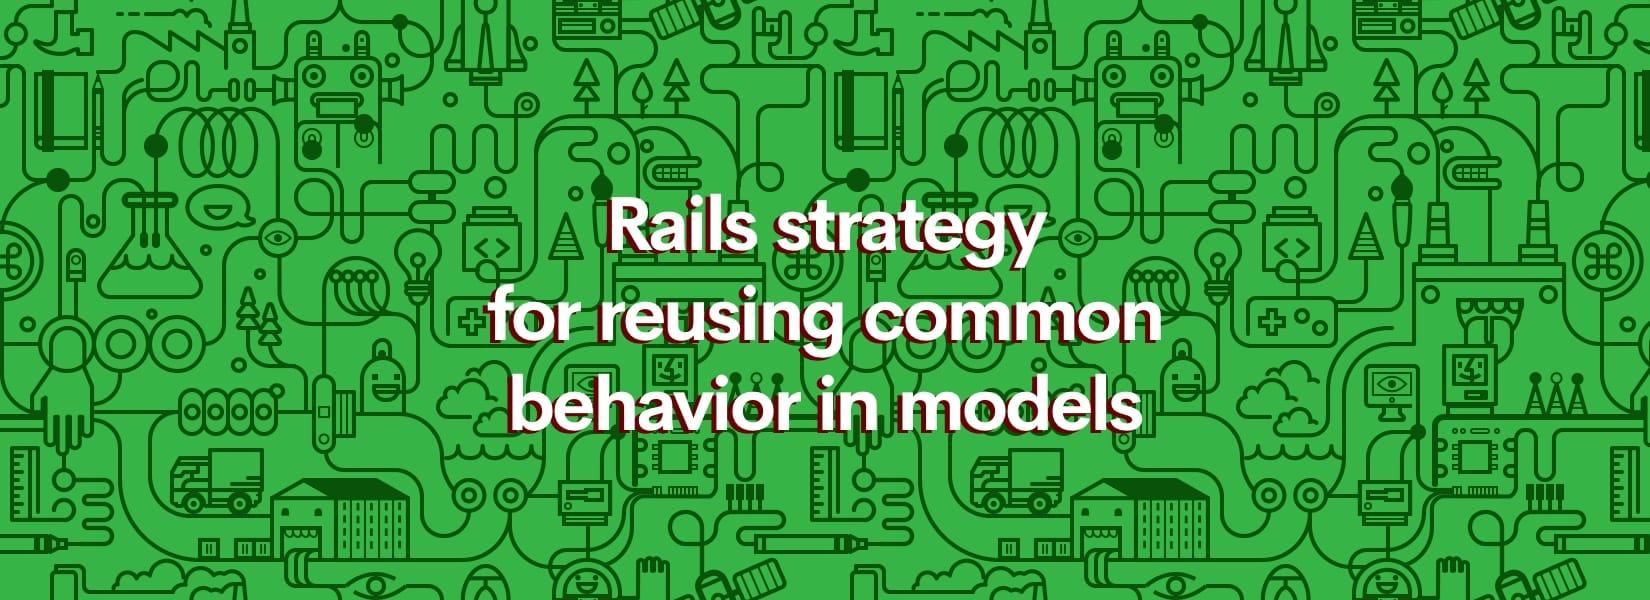 Rails strategy for reusing common behavior in models